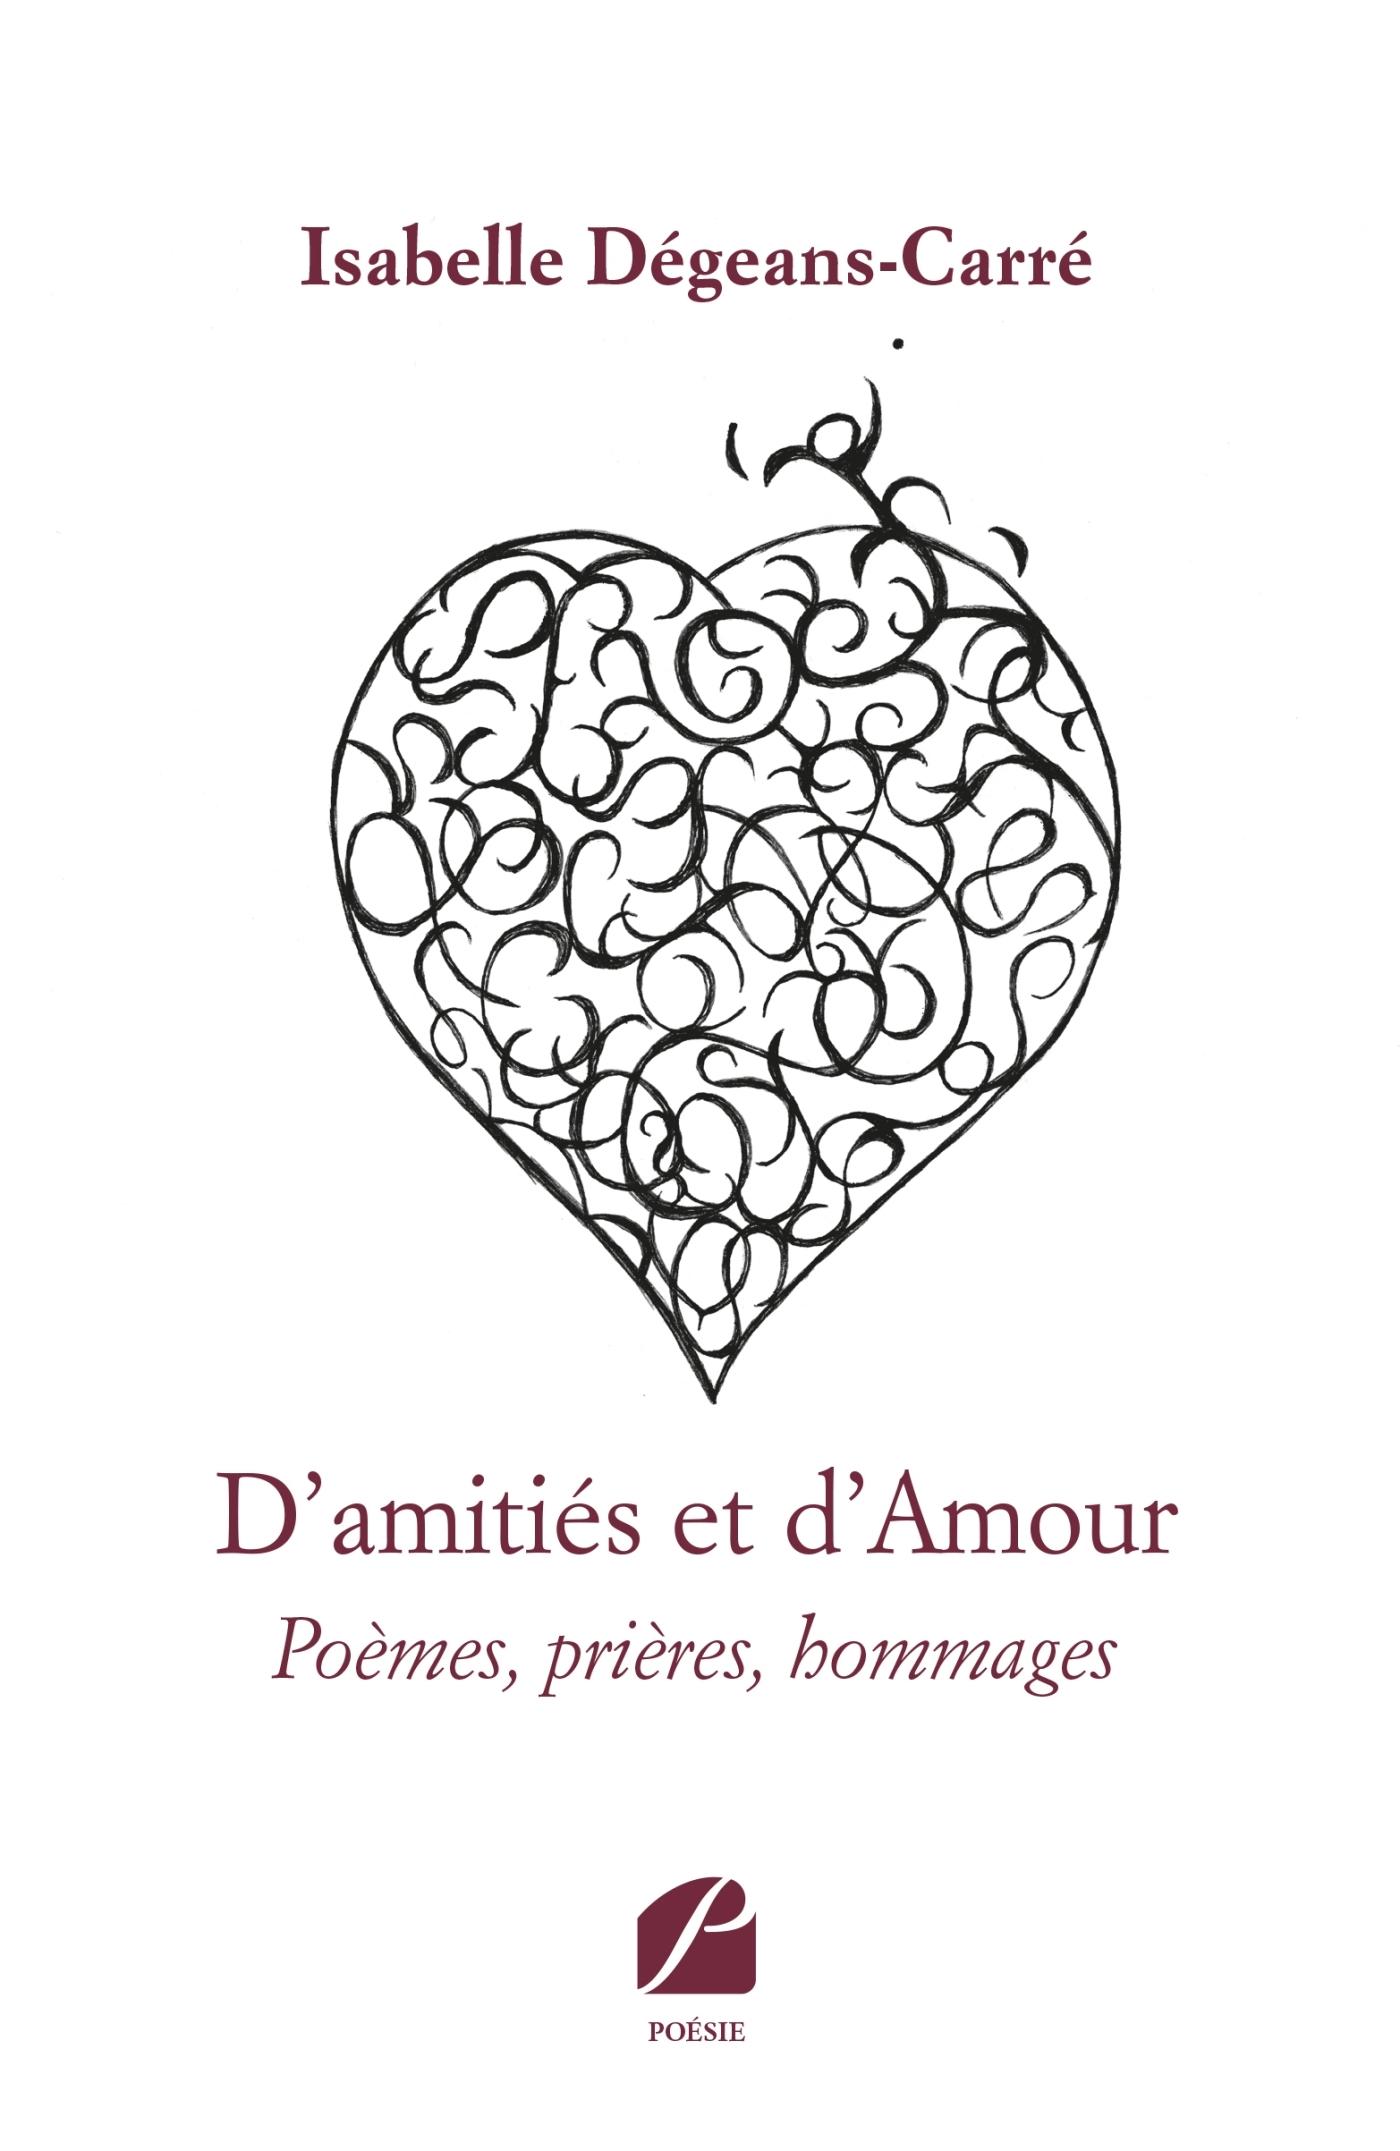 D'AMITIES ET D'AMOUR - POEMES, PRIERES, HOMMAGES